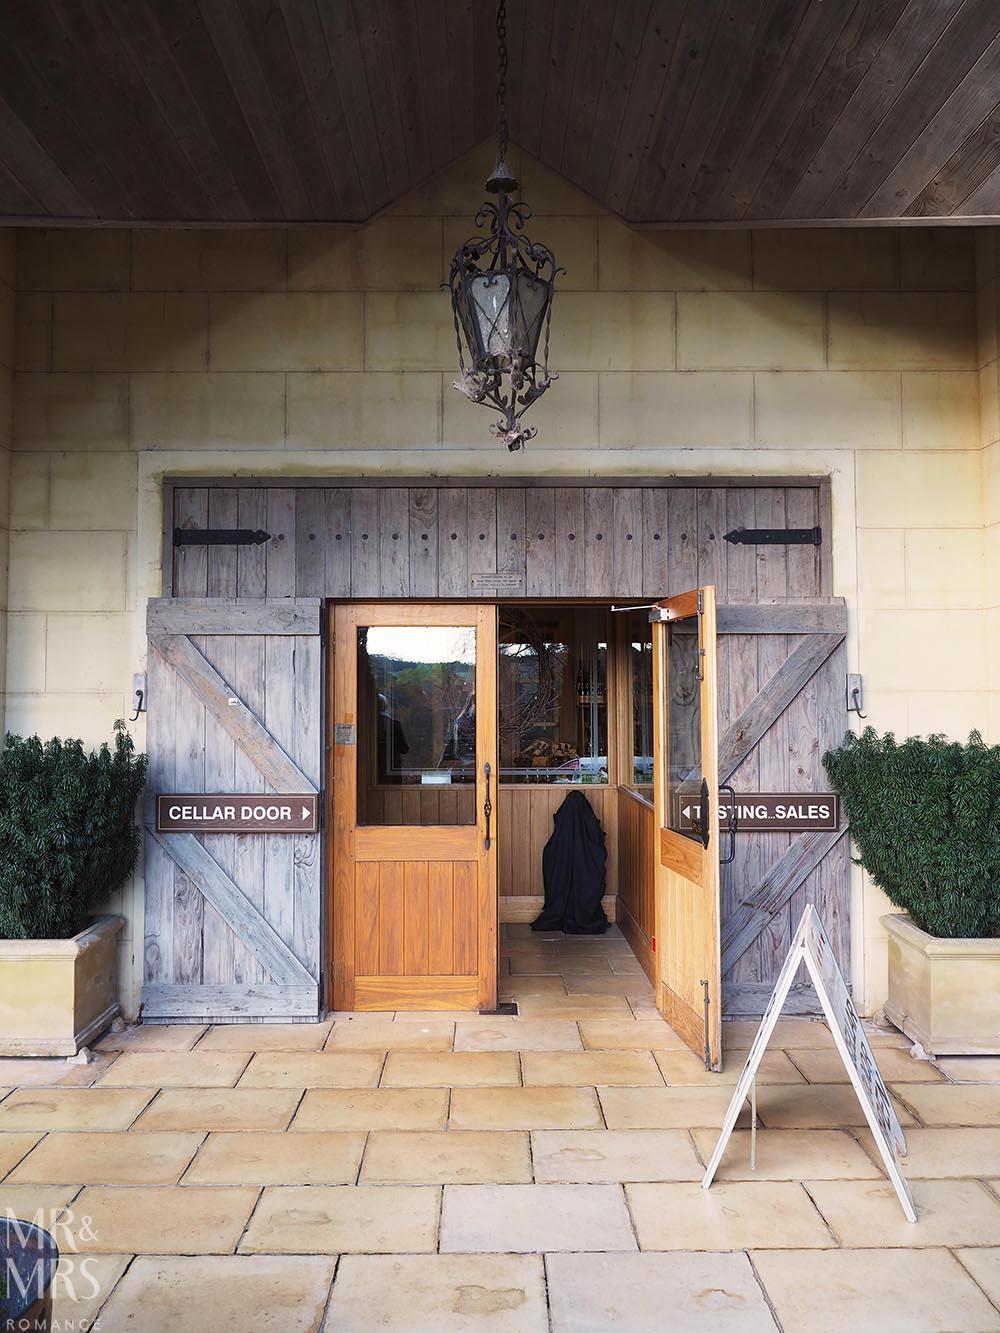 Pie Time Southern Highlands NSW - Centennial Vineyards cellar door